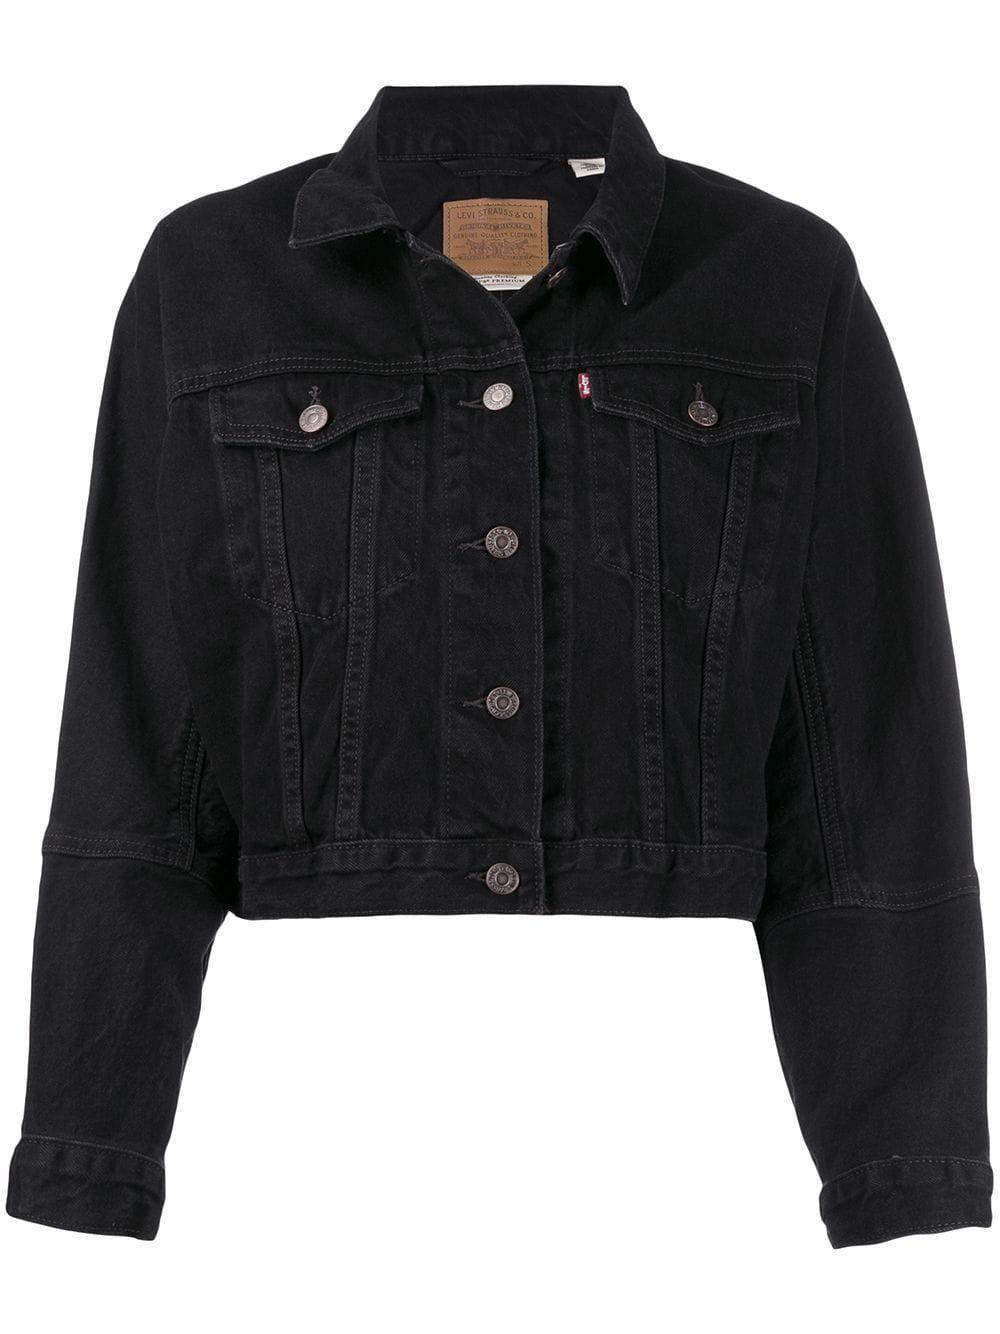 Levi S Cropped Denim Jacket Farfetch Cropped Denim Jacket Denim Jacket Women Denim Jacket [ 1334 x 1000 Pixel ]